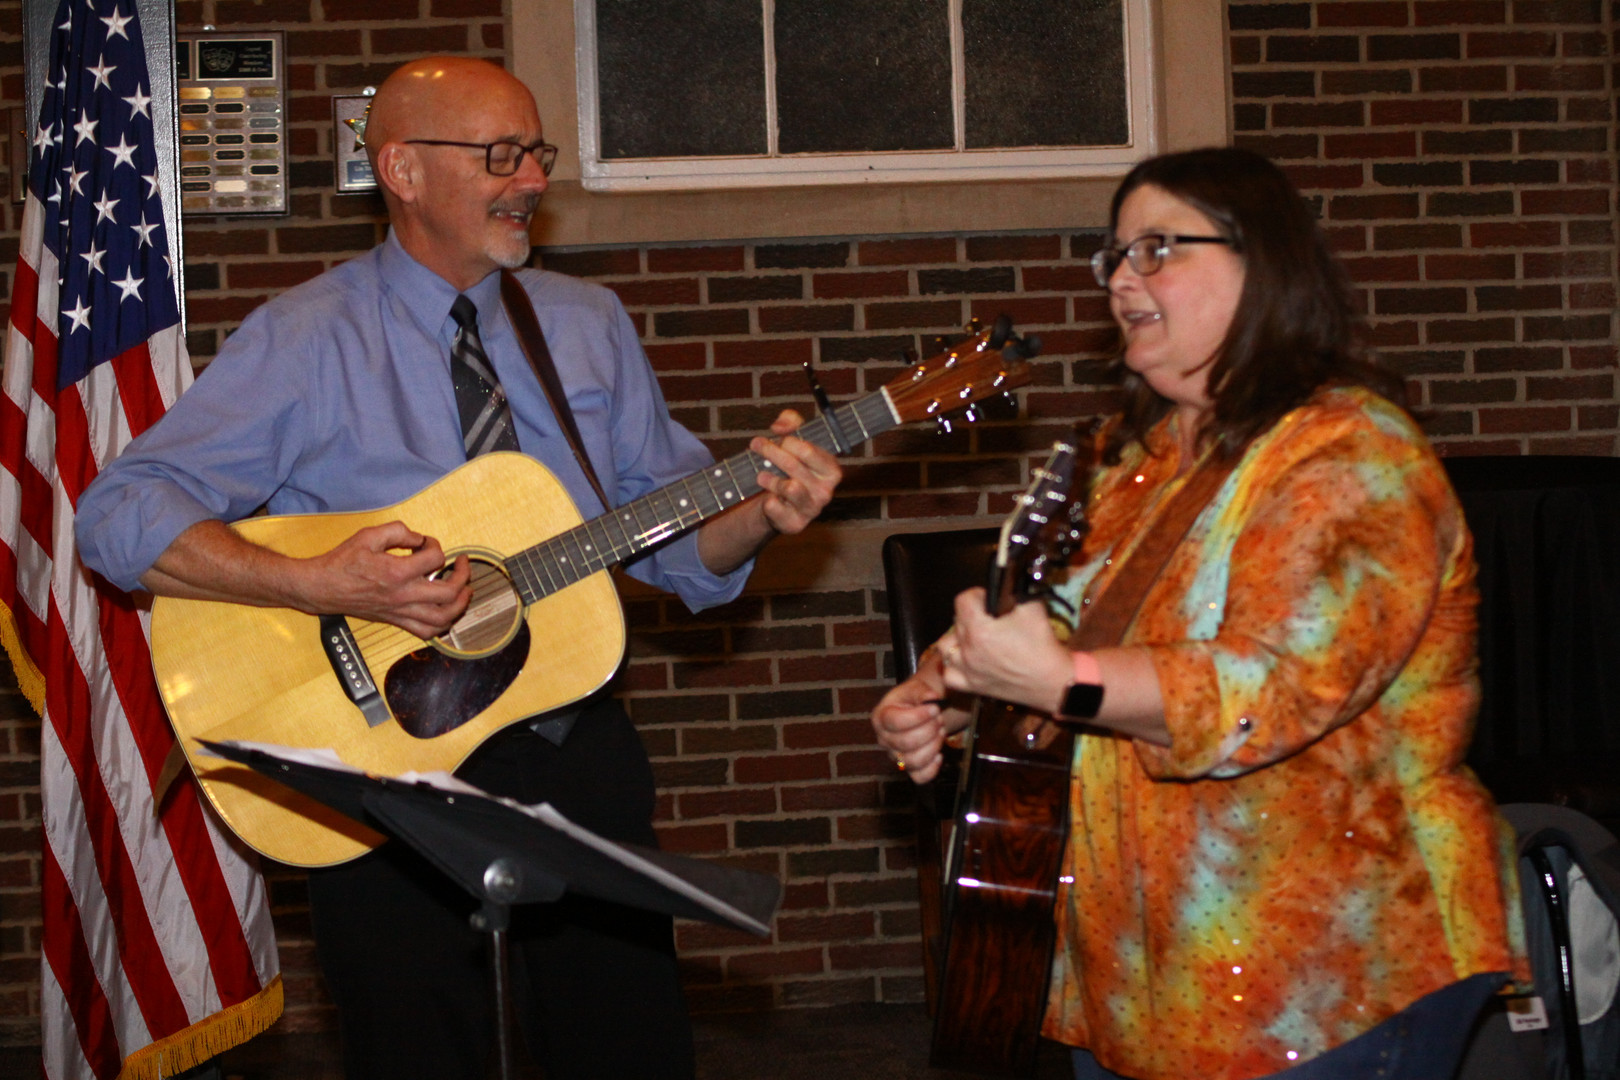 Bill Persinger & Wendy Senogles